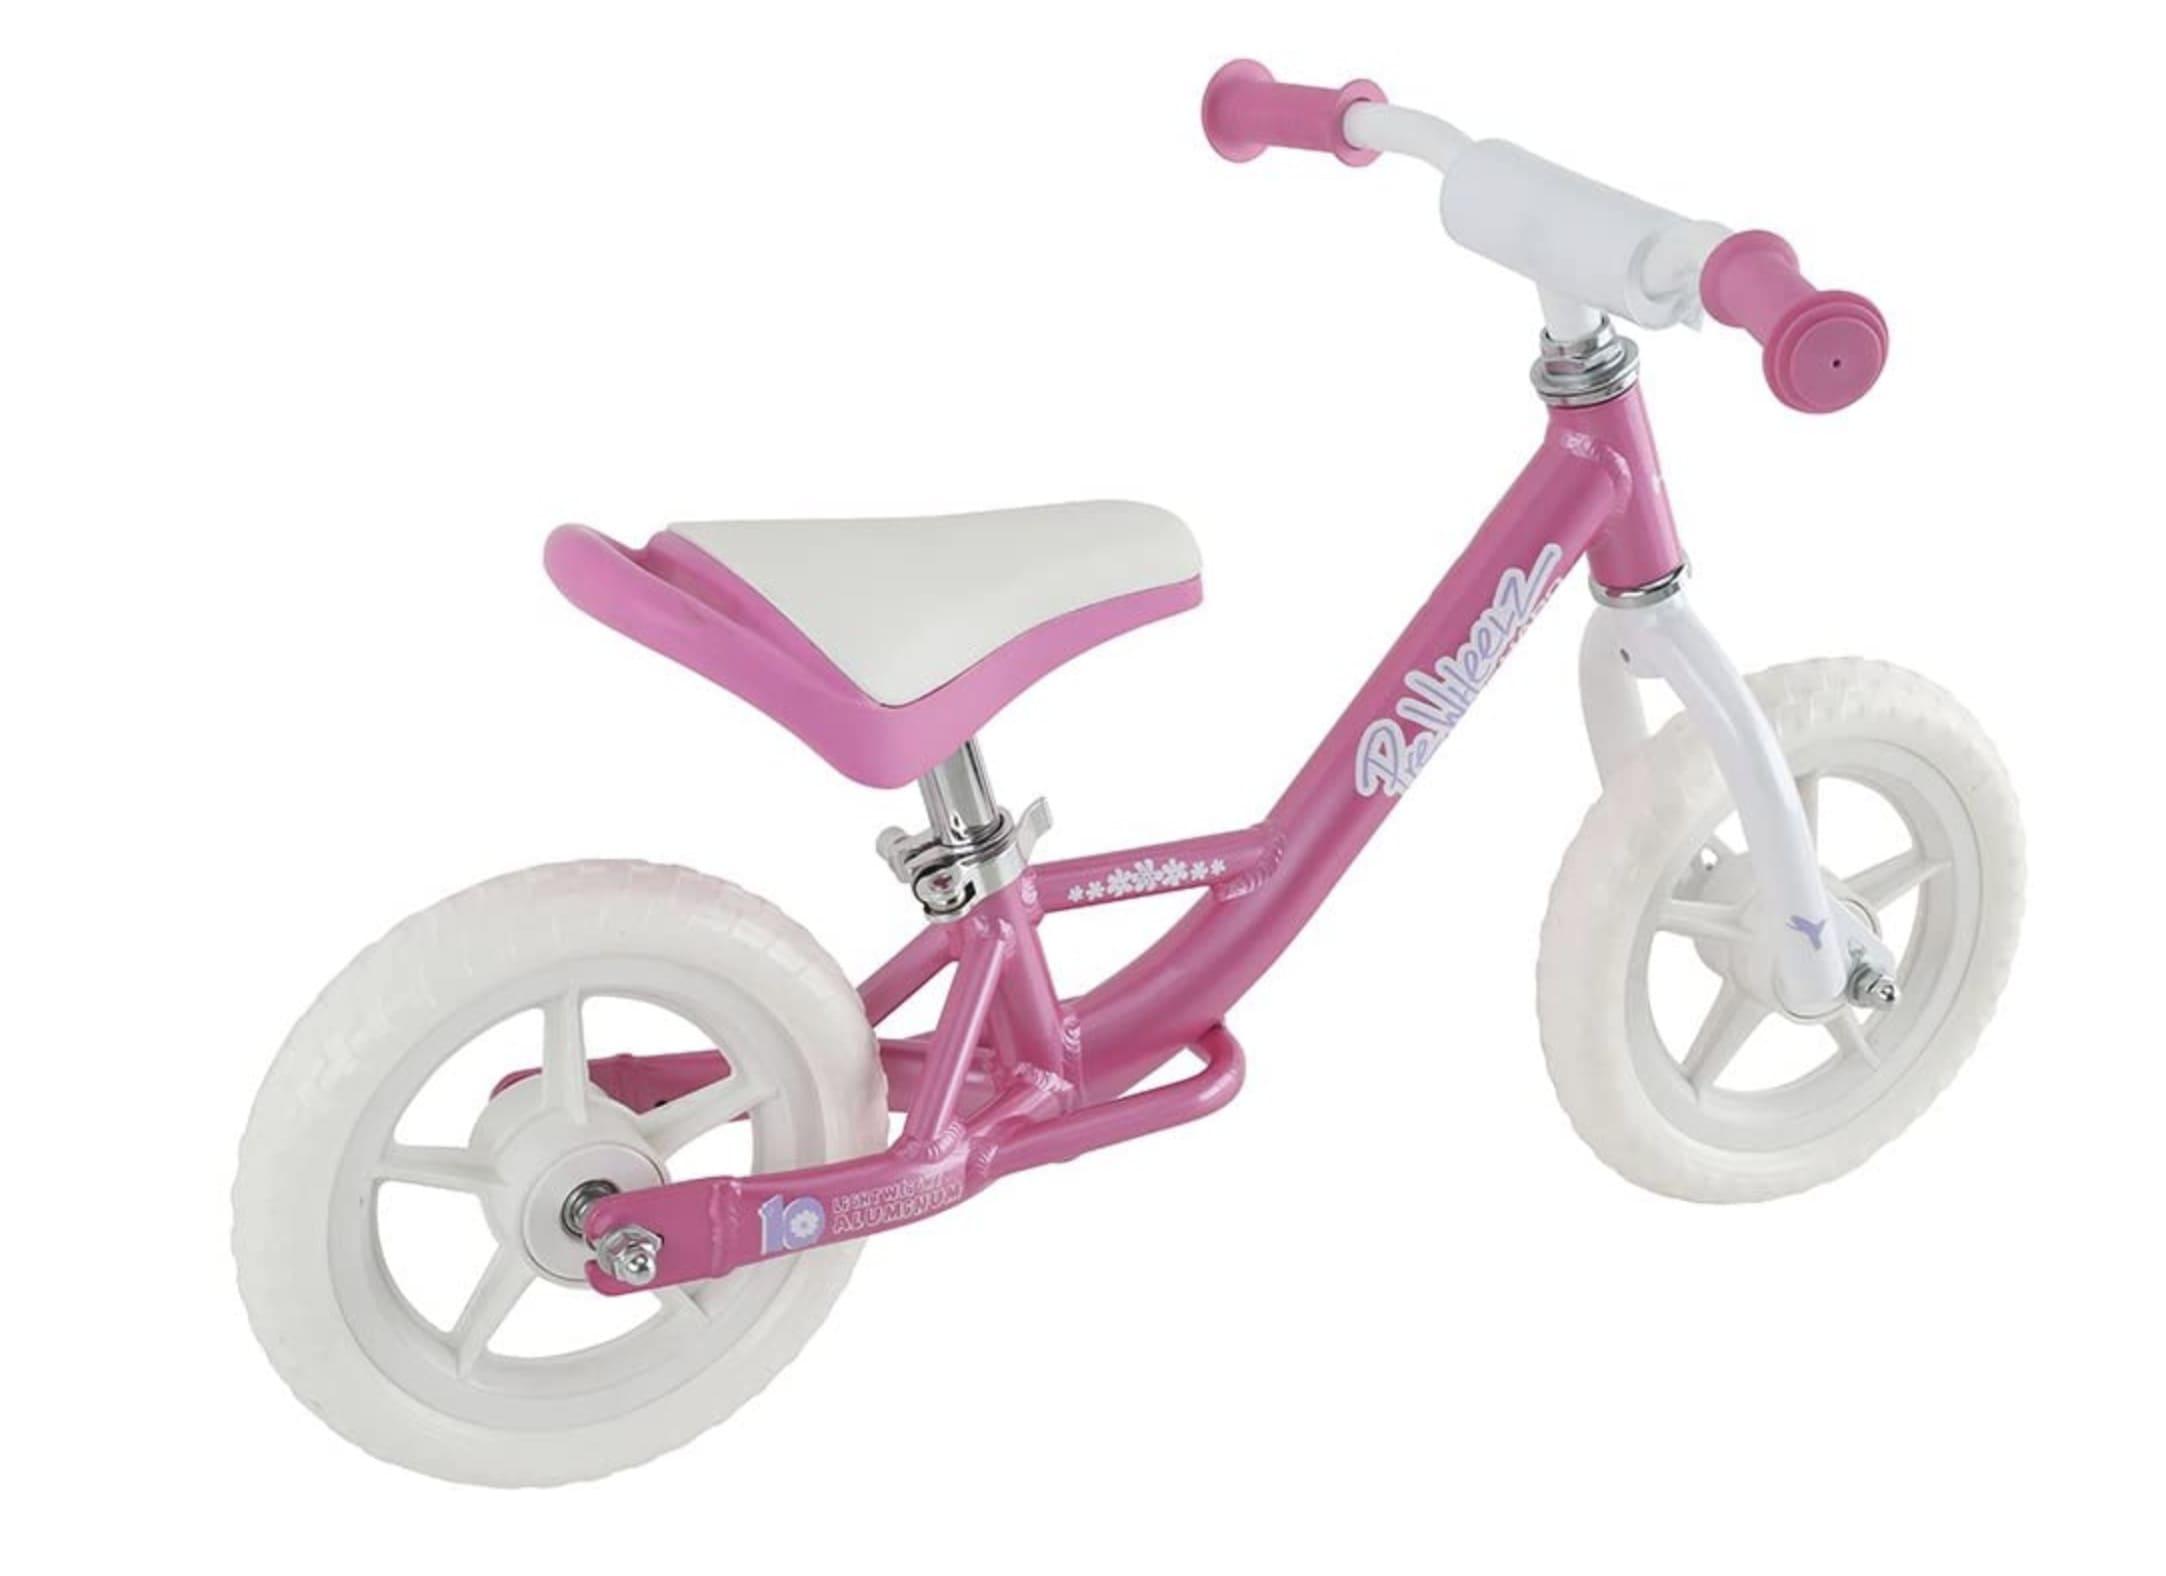 Bicicleta sin pedales para niña Hero PreWheelz rosa